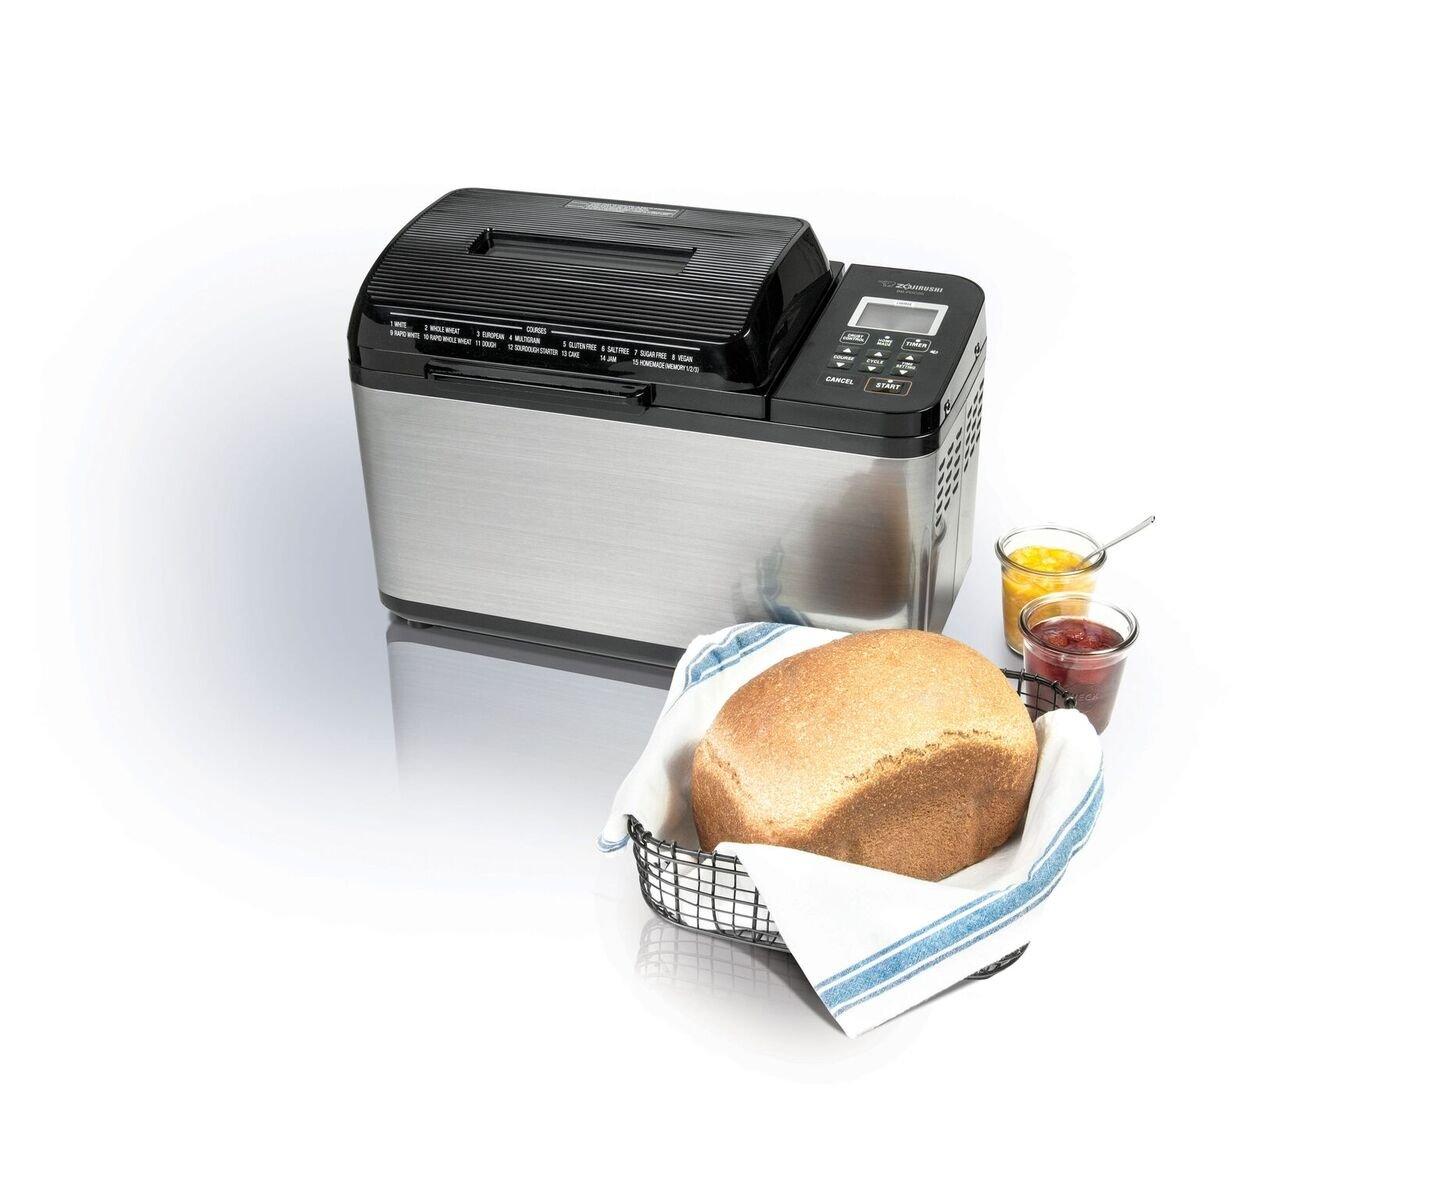 Zojirushi BB-PDC20BA Home Bakery Virtuoso Plus Breadmaker, 2 lb. loaf of bread, Stainless Steel/Black by Zojirushi